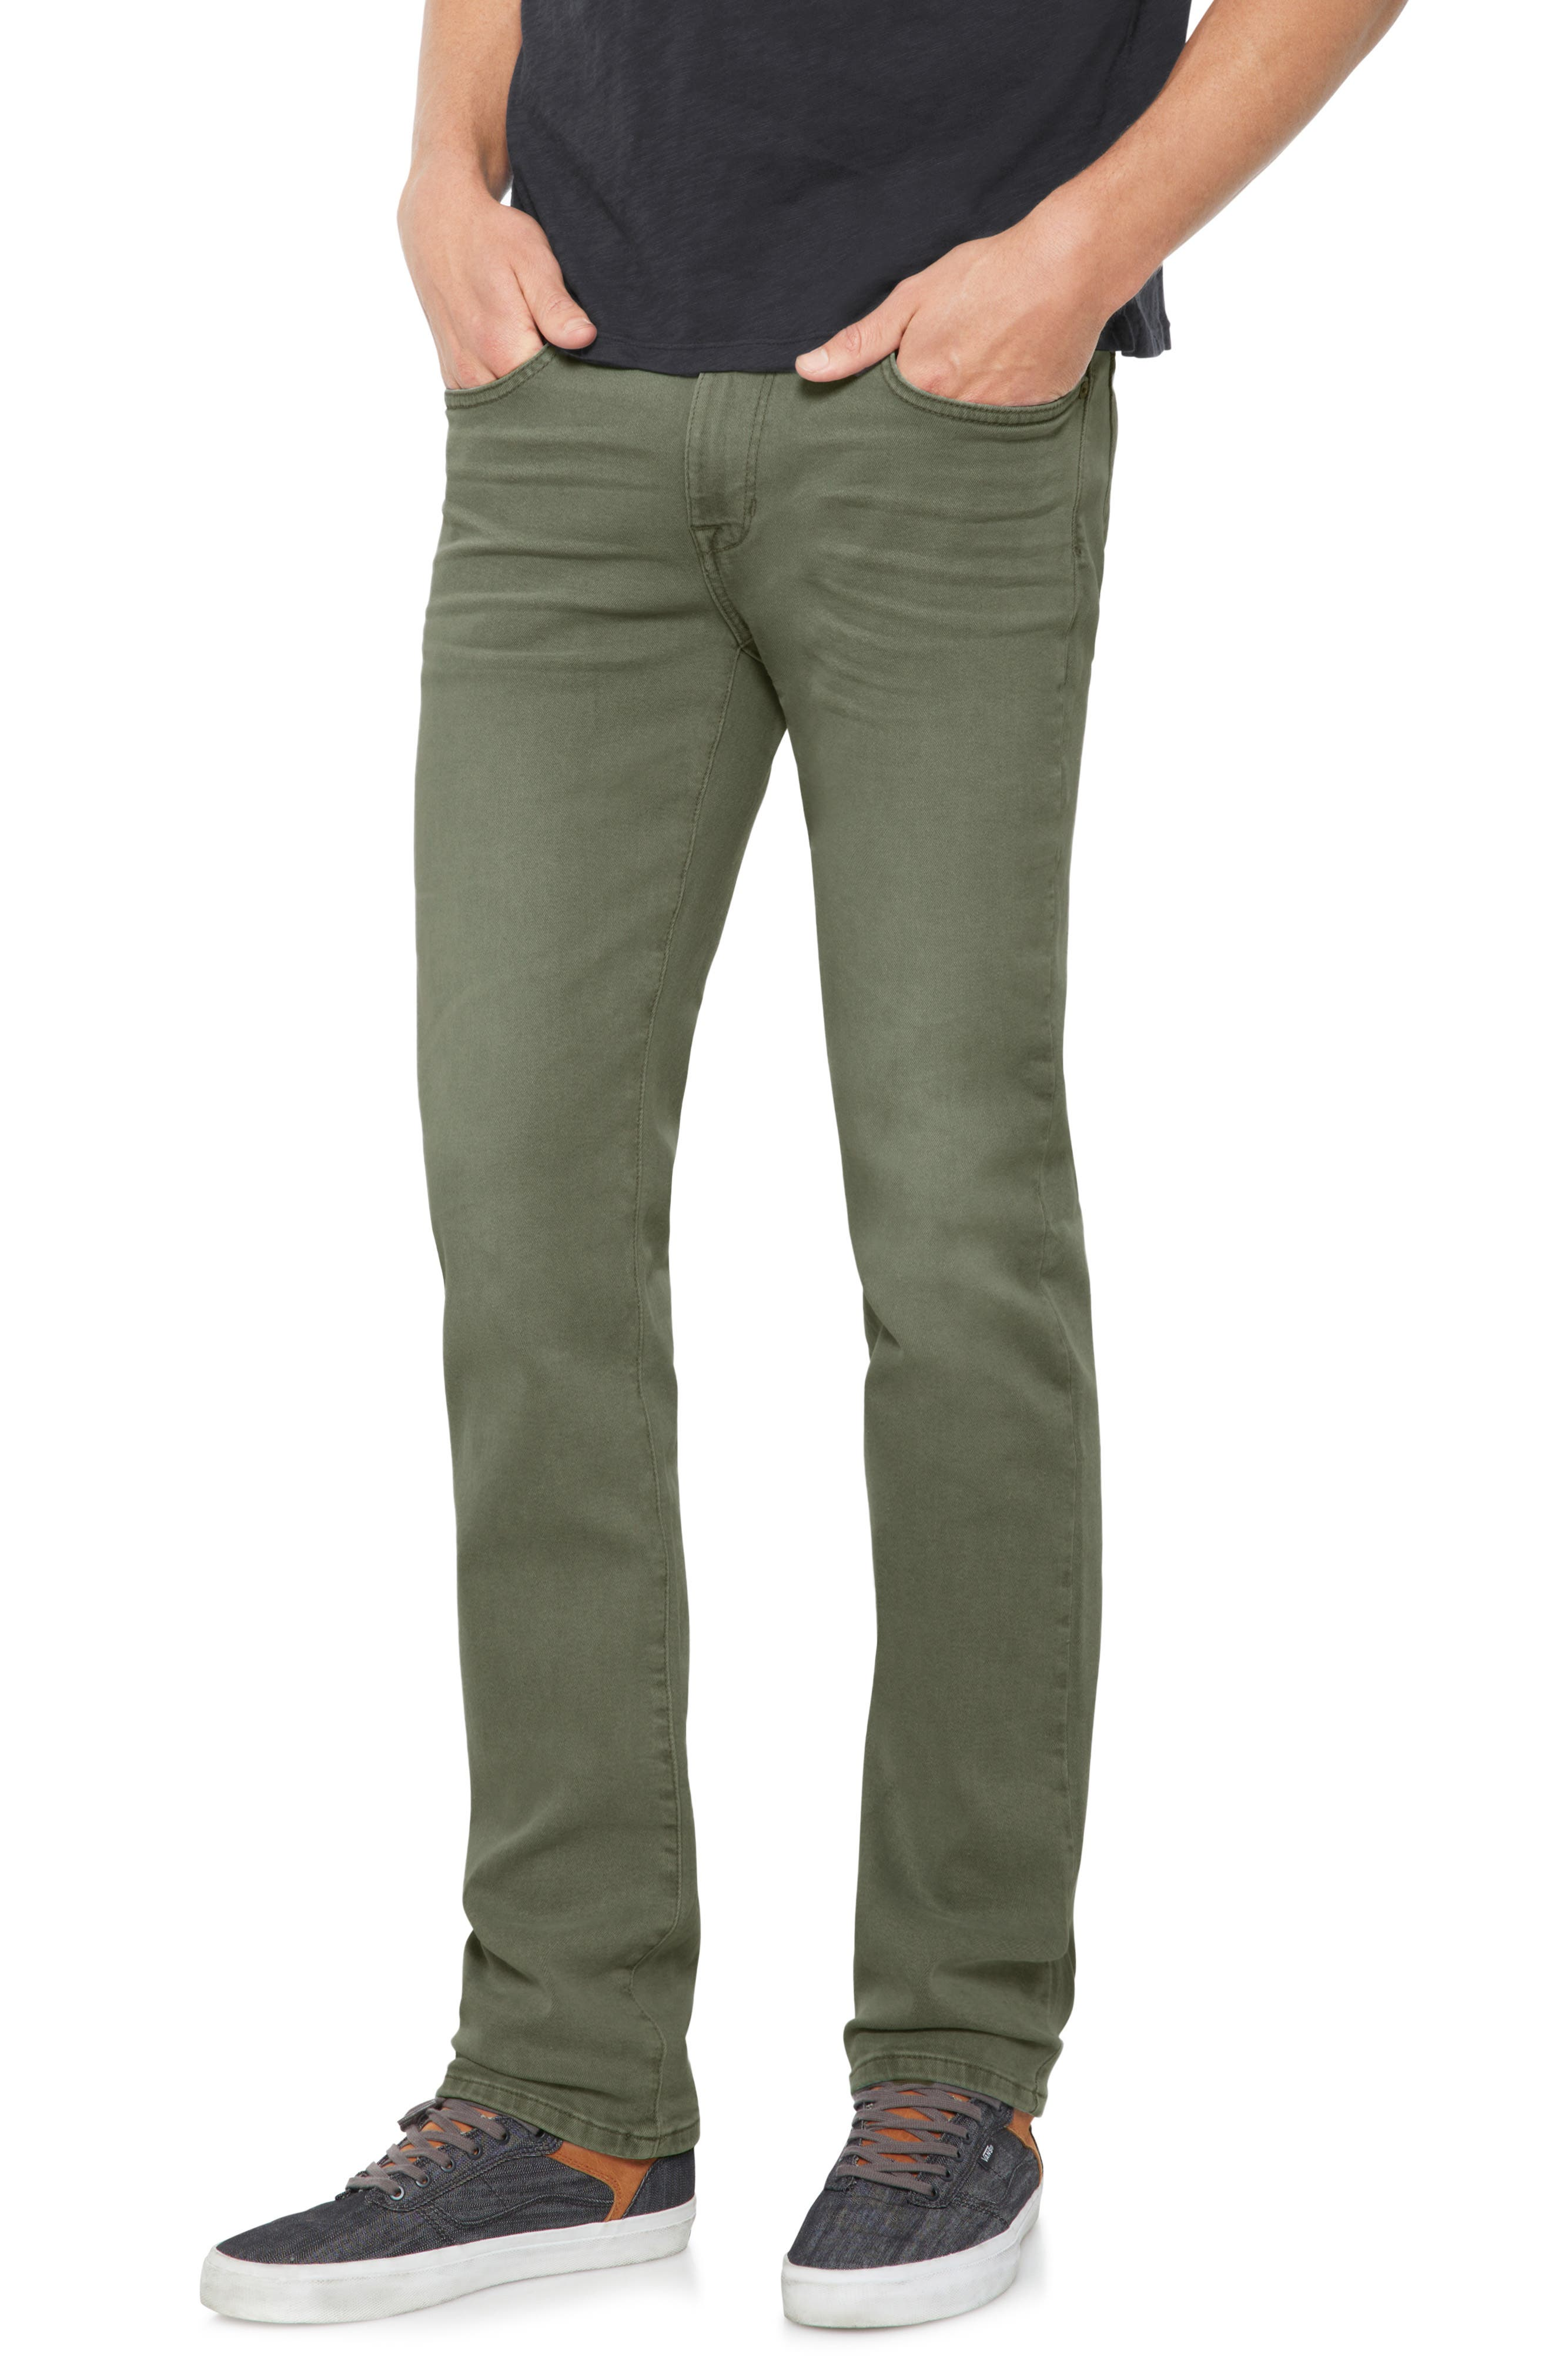 Brixton Slim Straight Leg Jeans,                         Main,                         color, Olive Tree